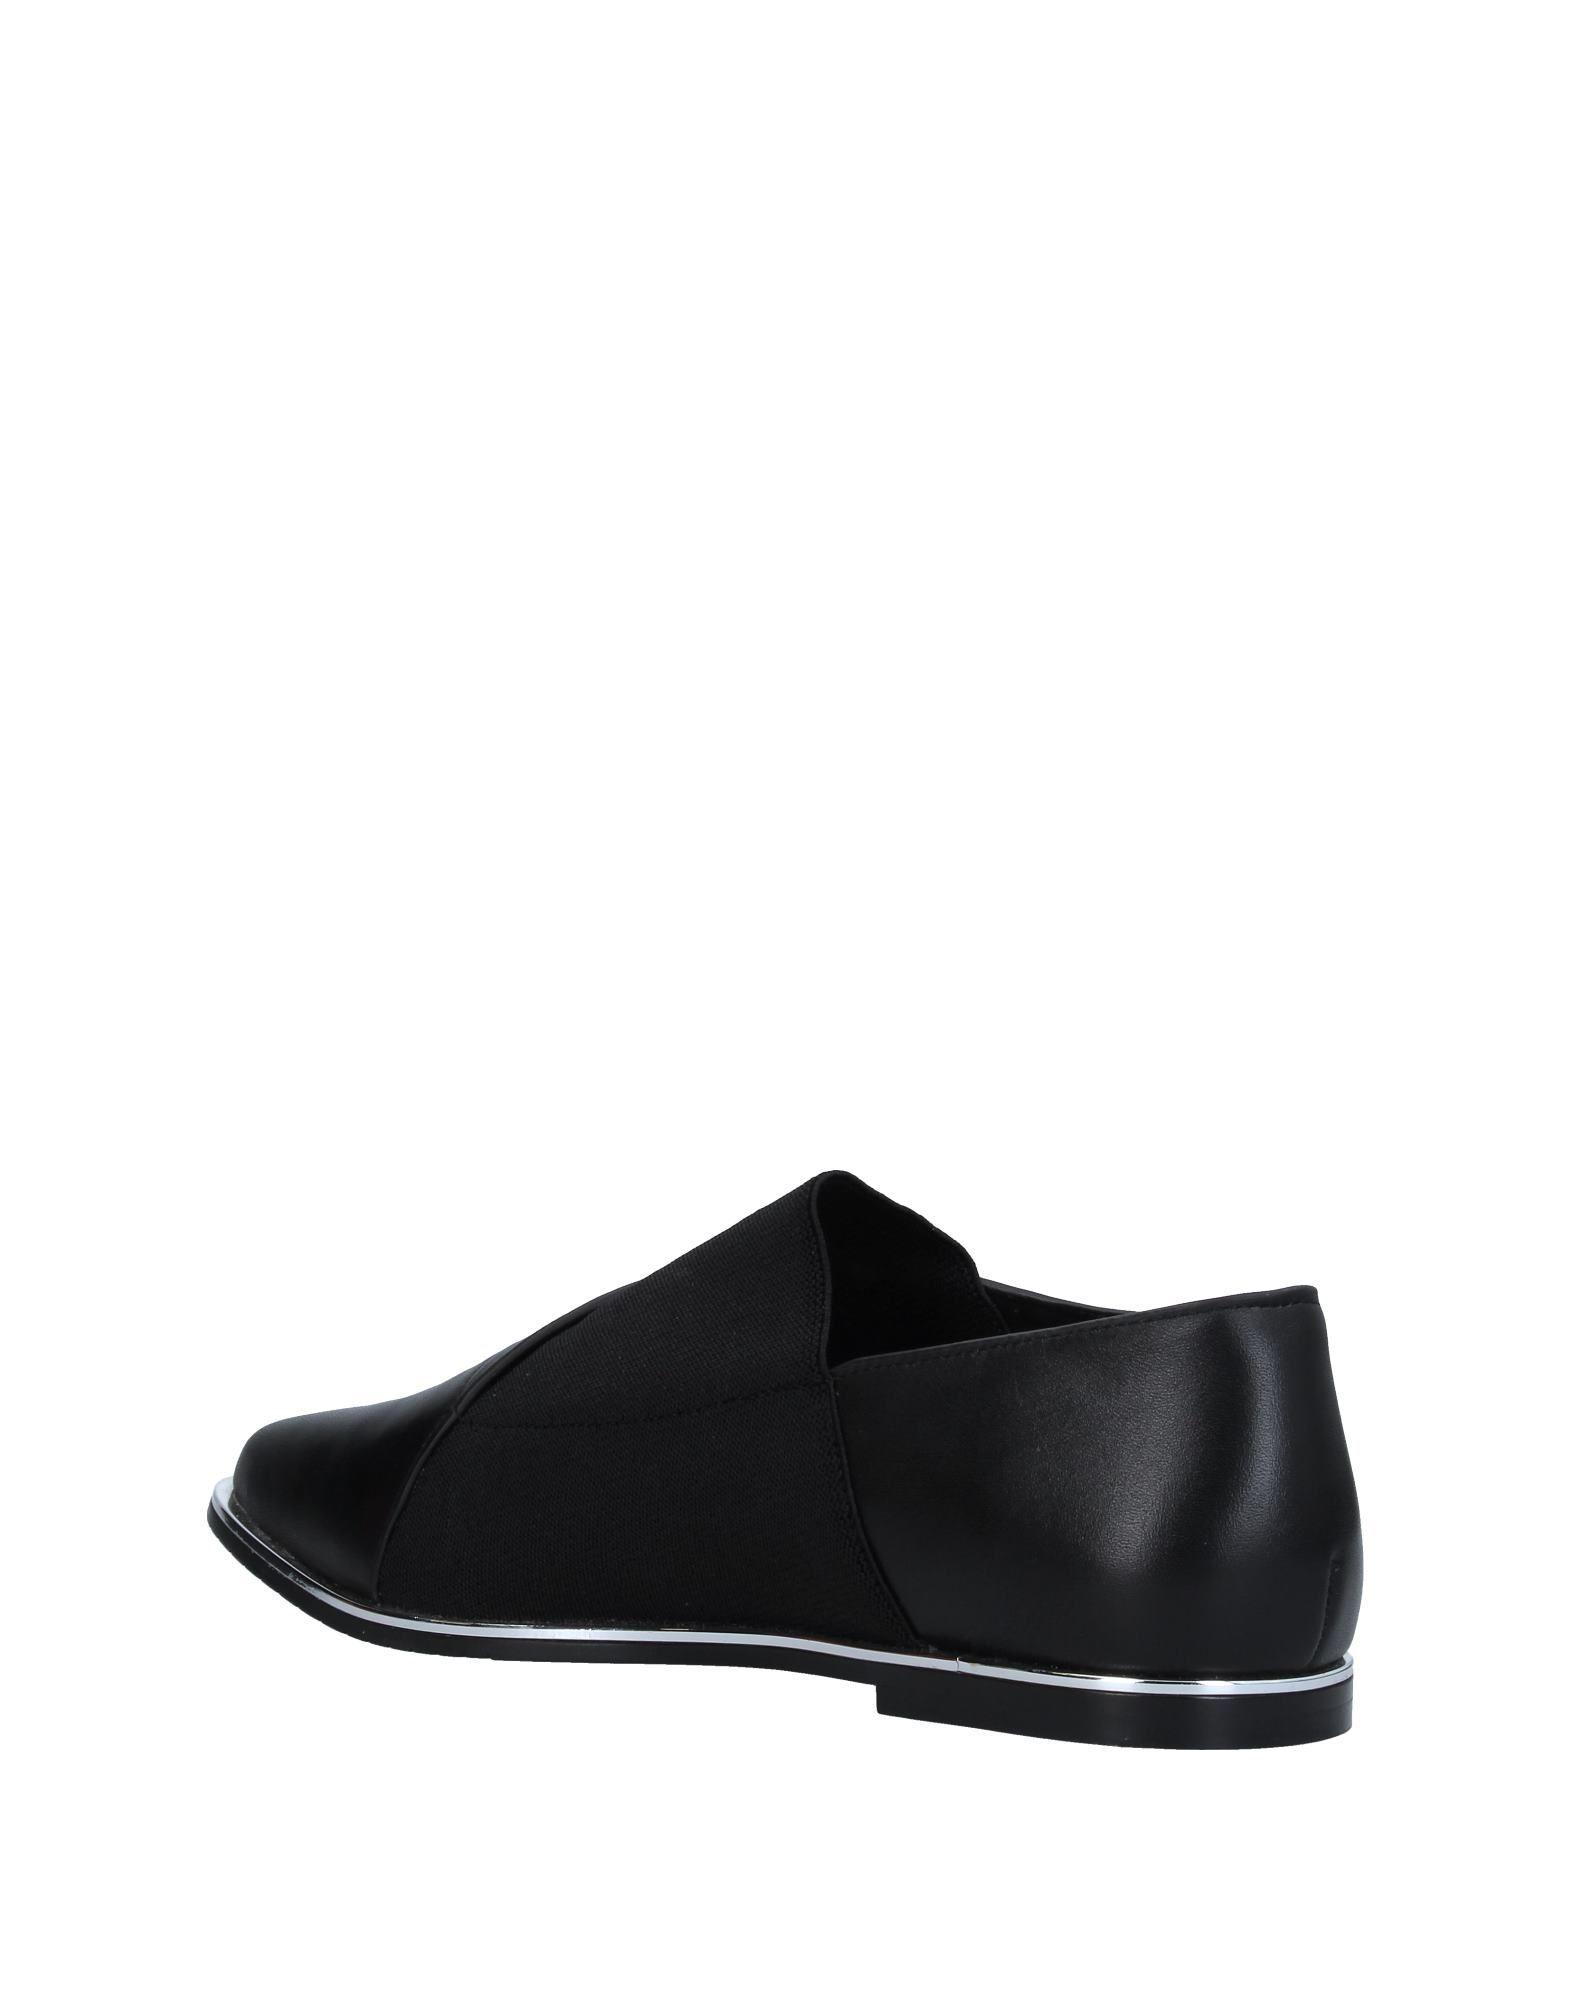 United Nude Mokassins Damen  Schuhe 11366983SIGut aussehende strapazierfähige Schuhe  f1373f